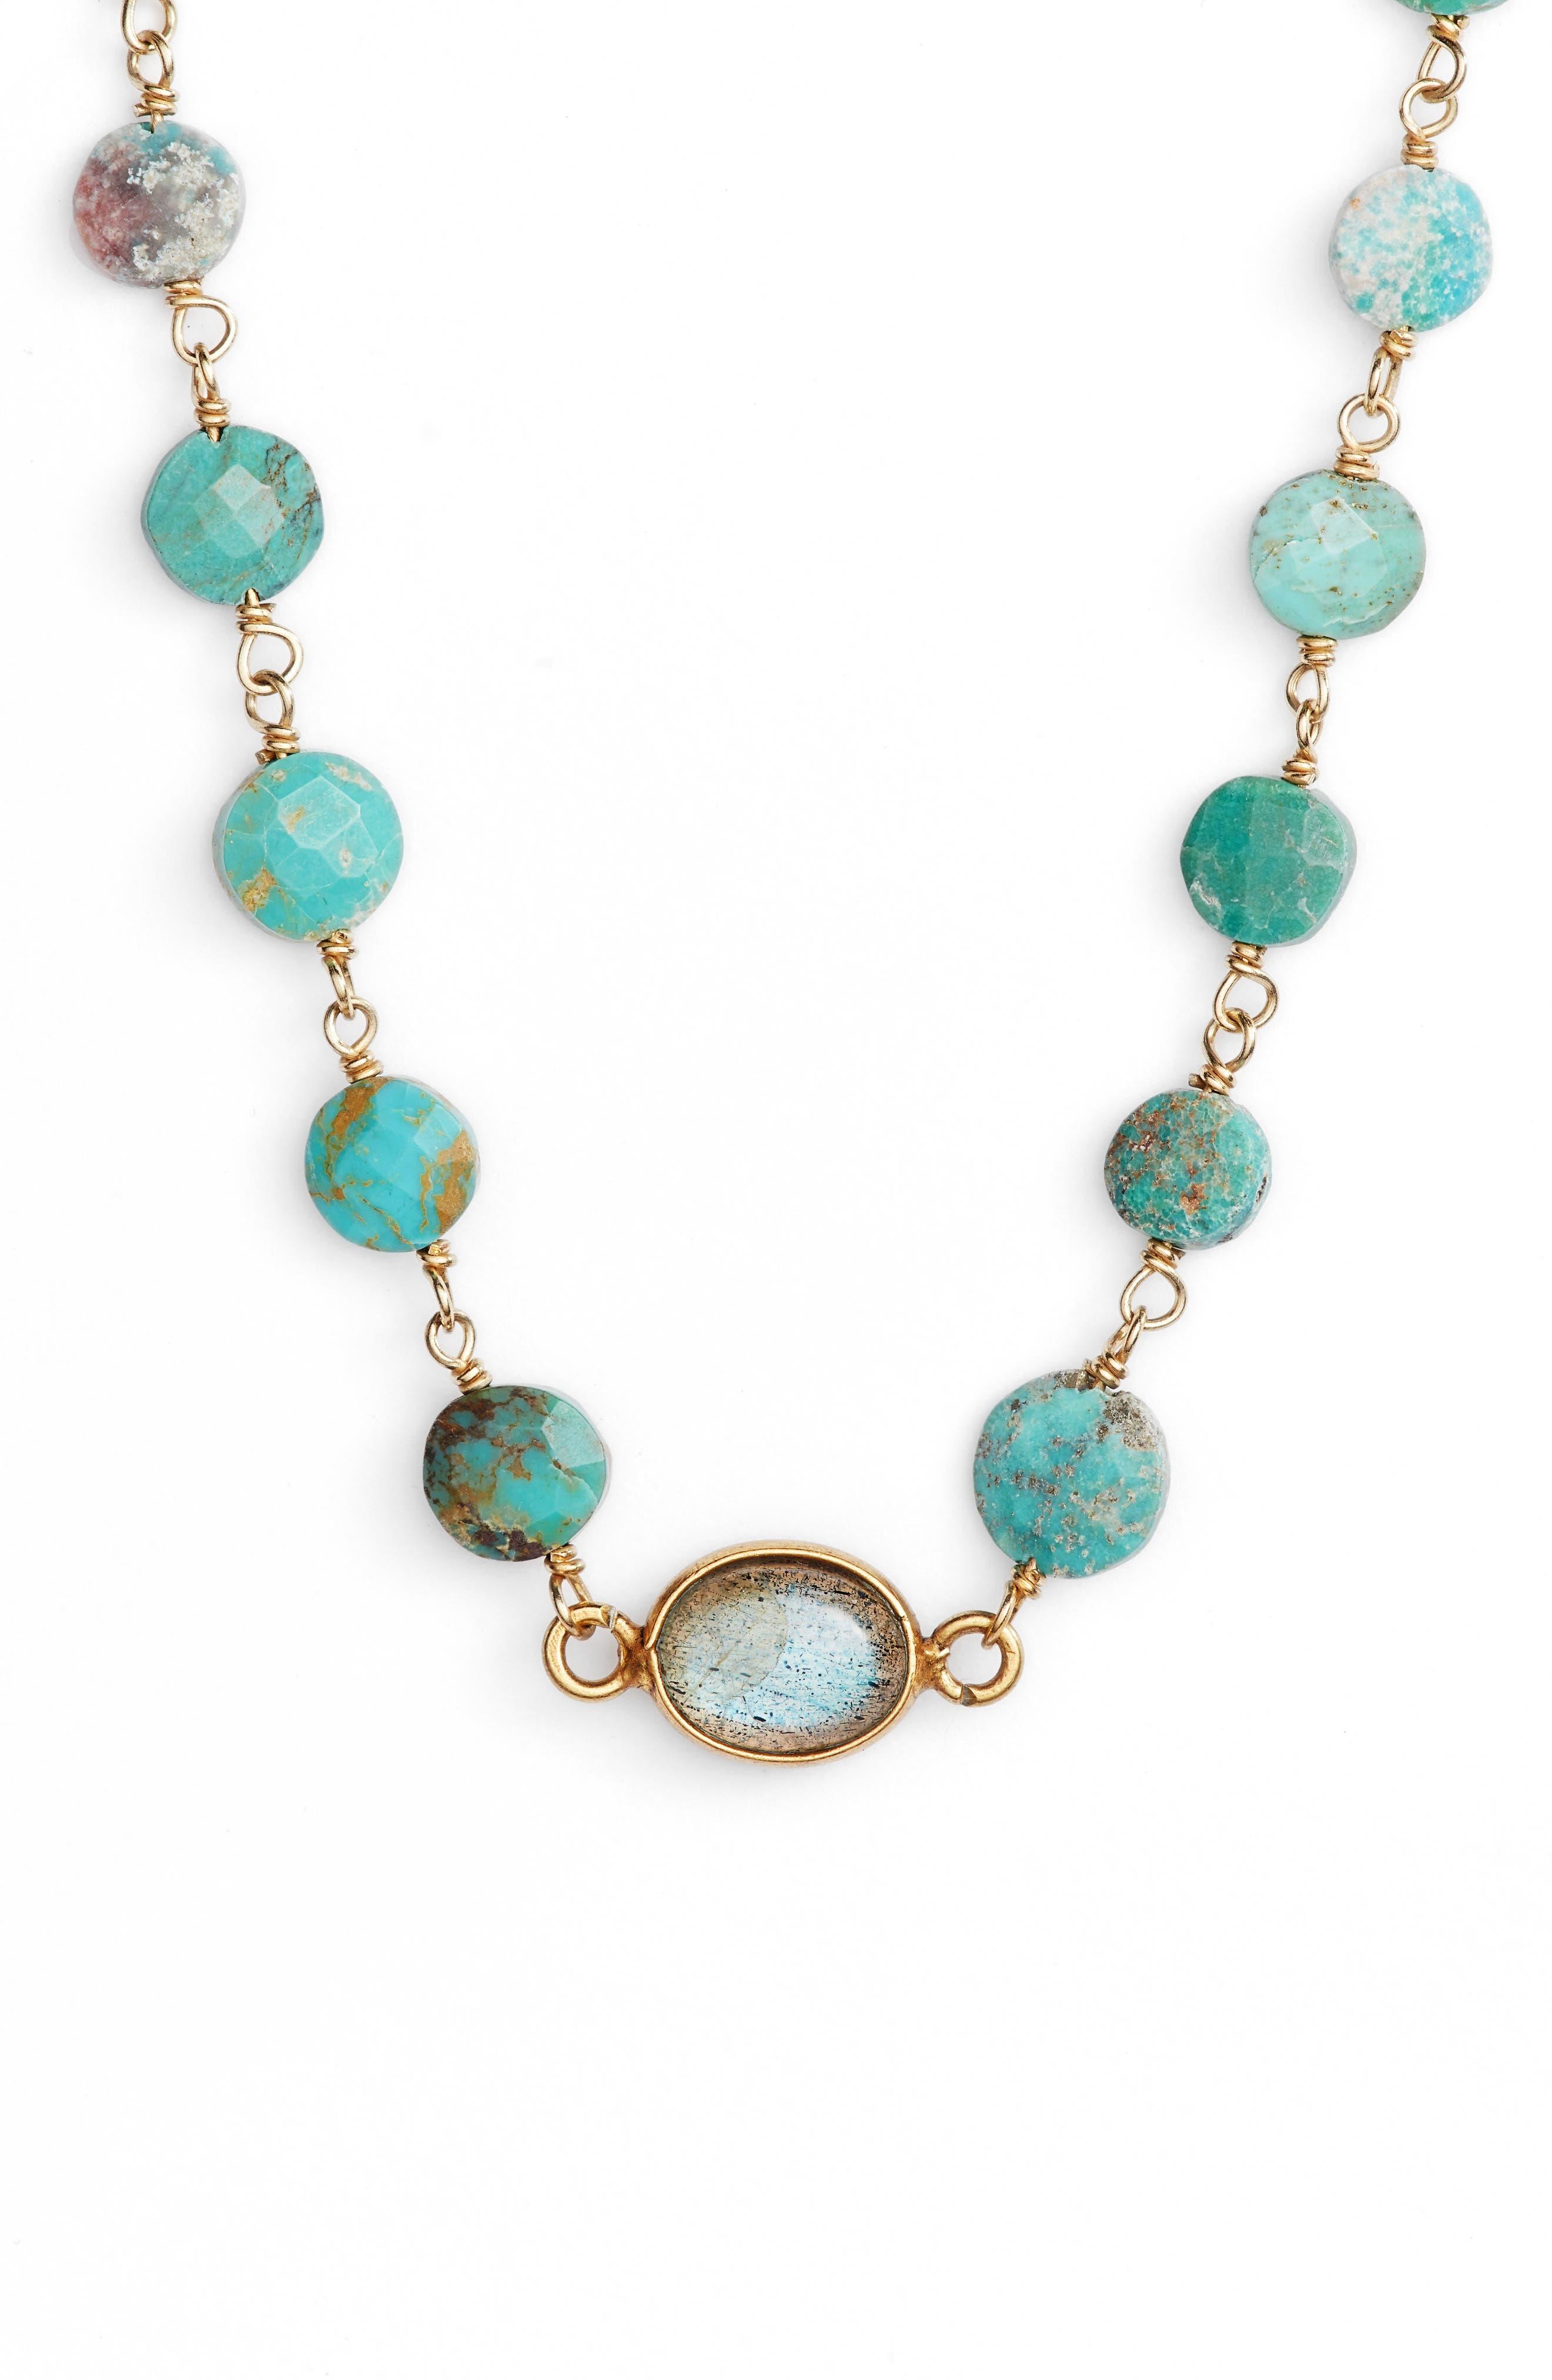 Alternate Image 1 Selected - ela rae Libi Coin Pendant Necklace